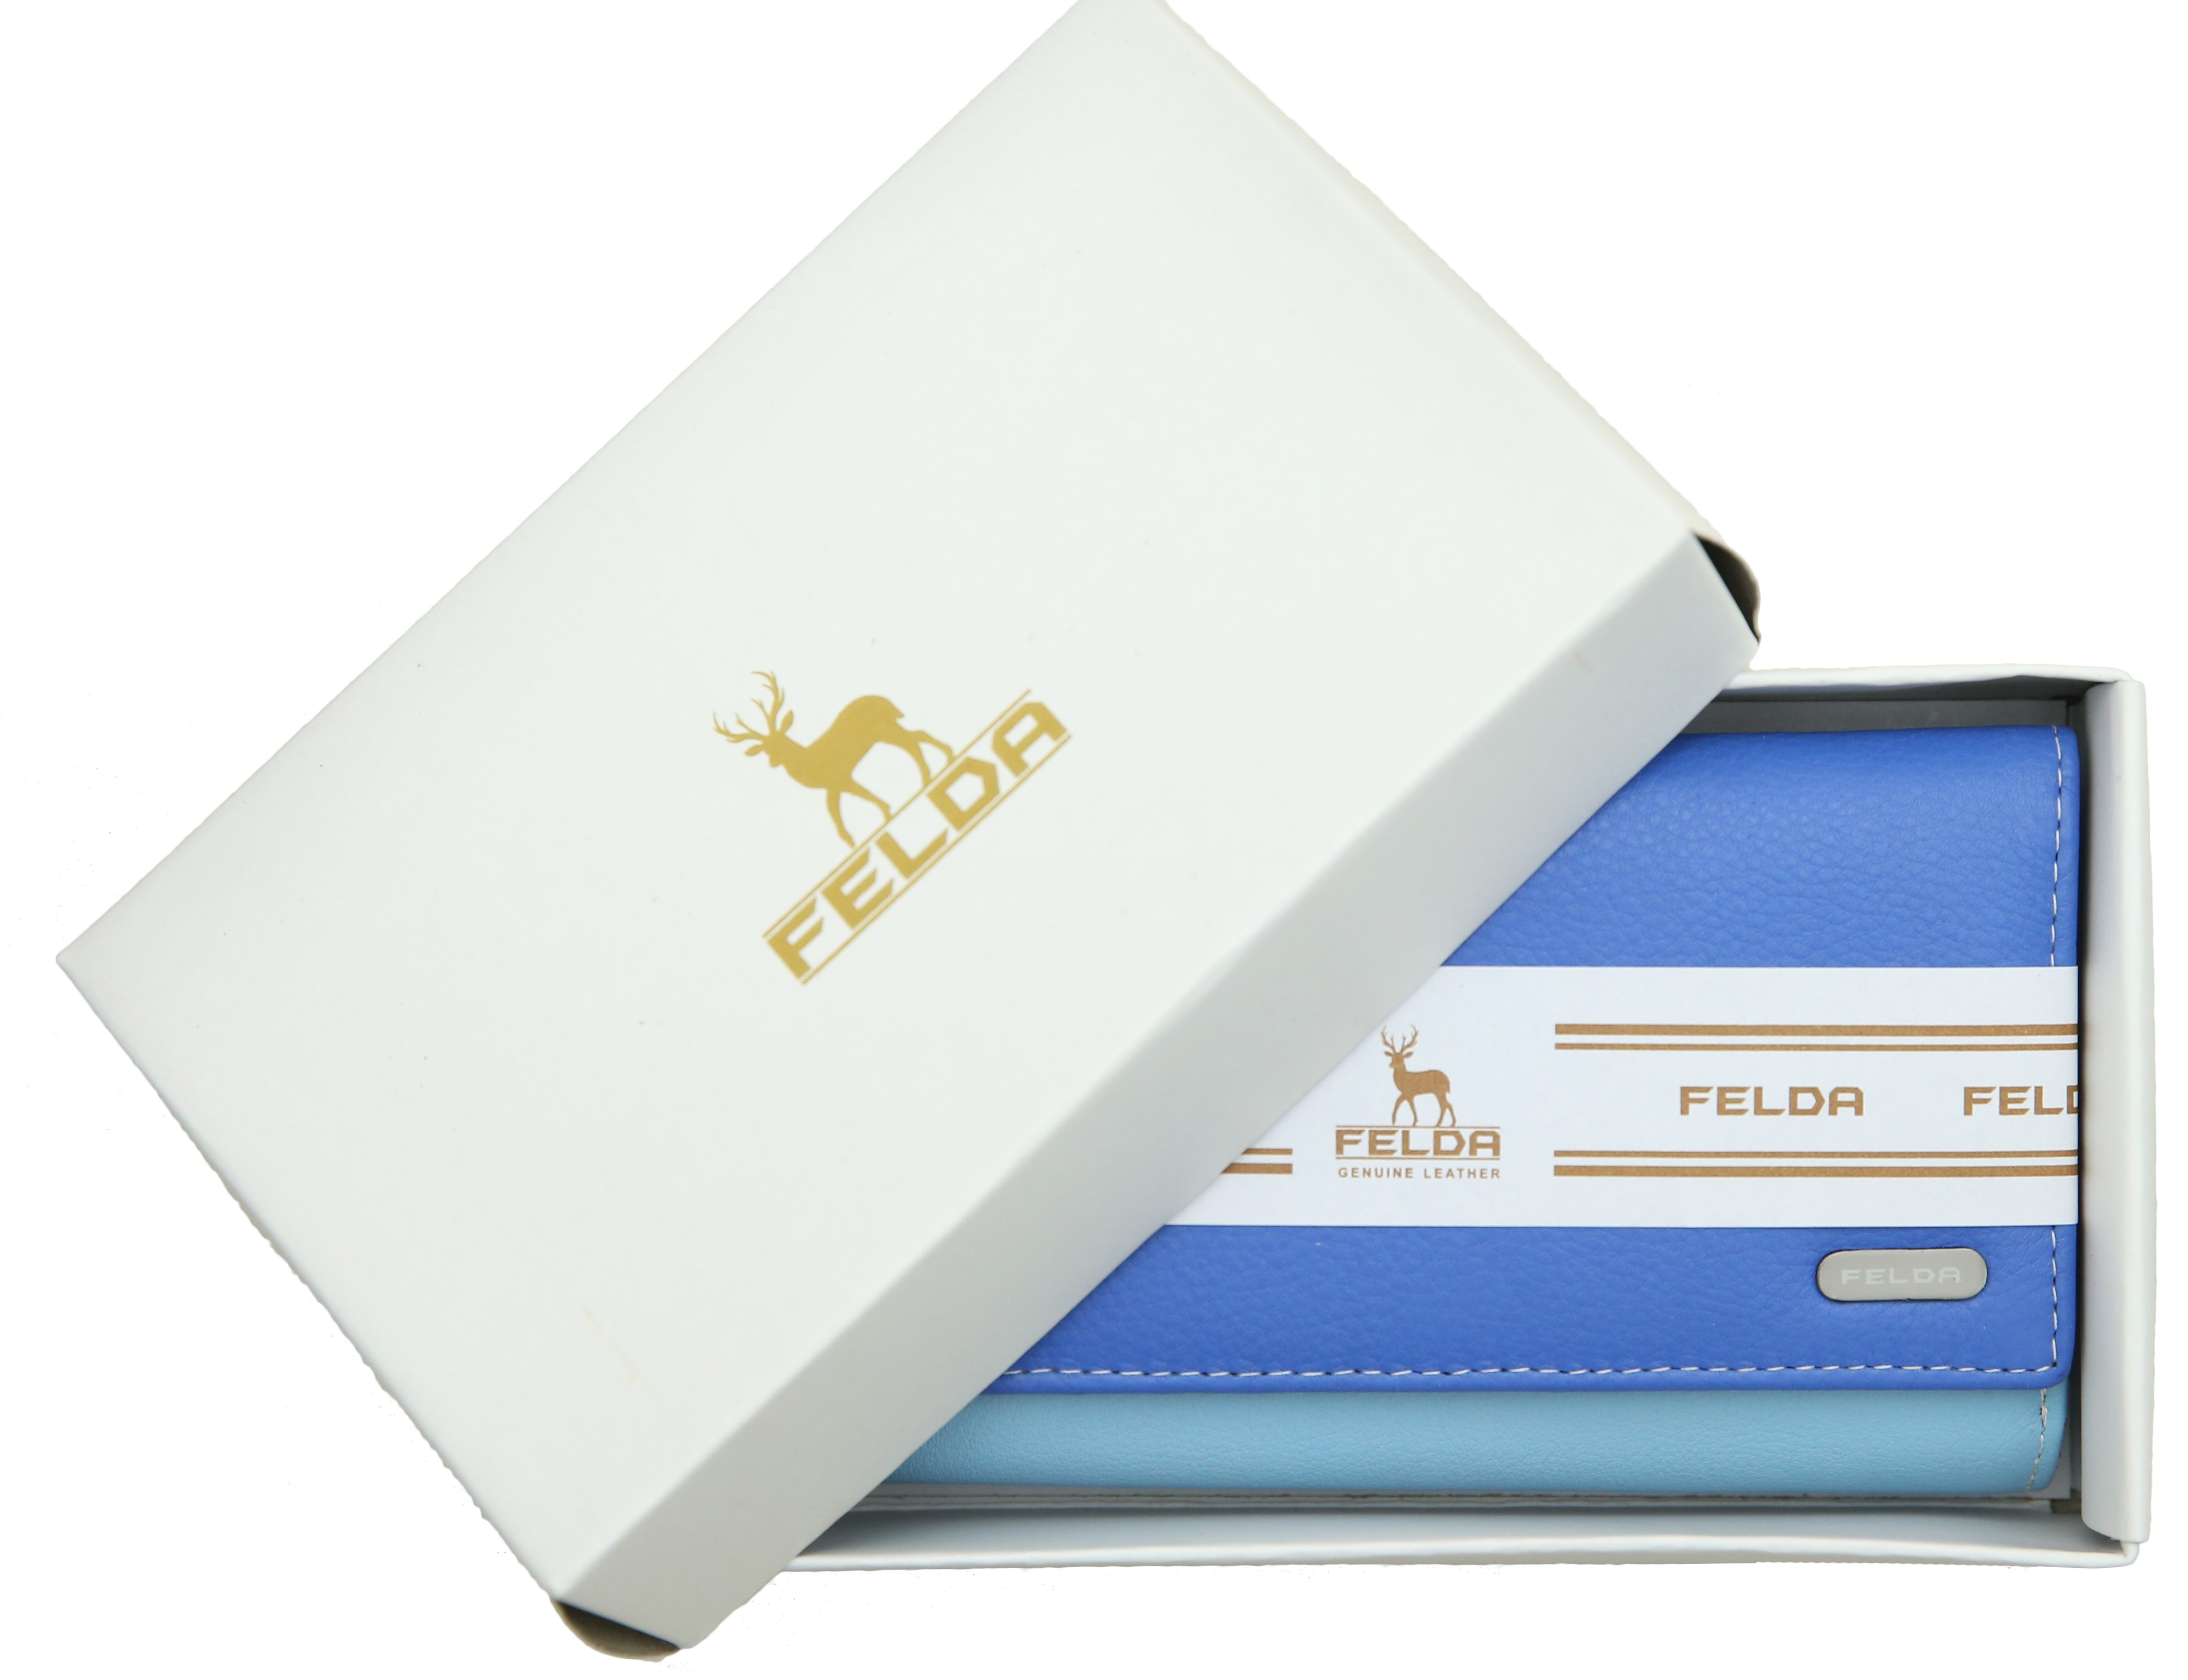 Felda-Portefeuille-pour-cartes-de-credit-cuir-souple-plusieurs-coloris miniature 13